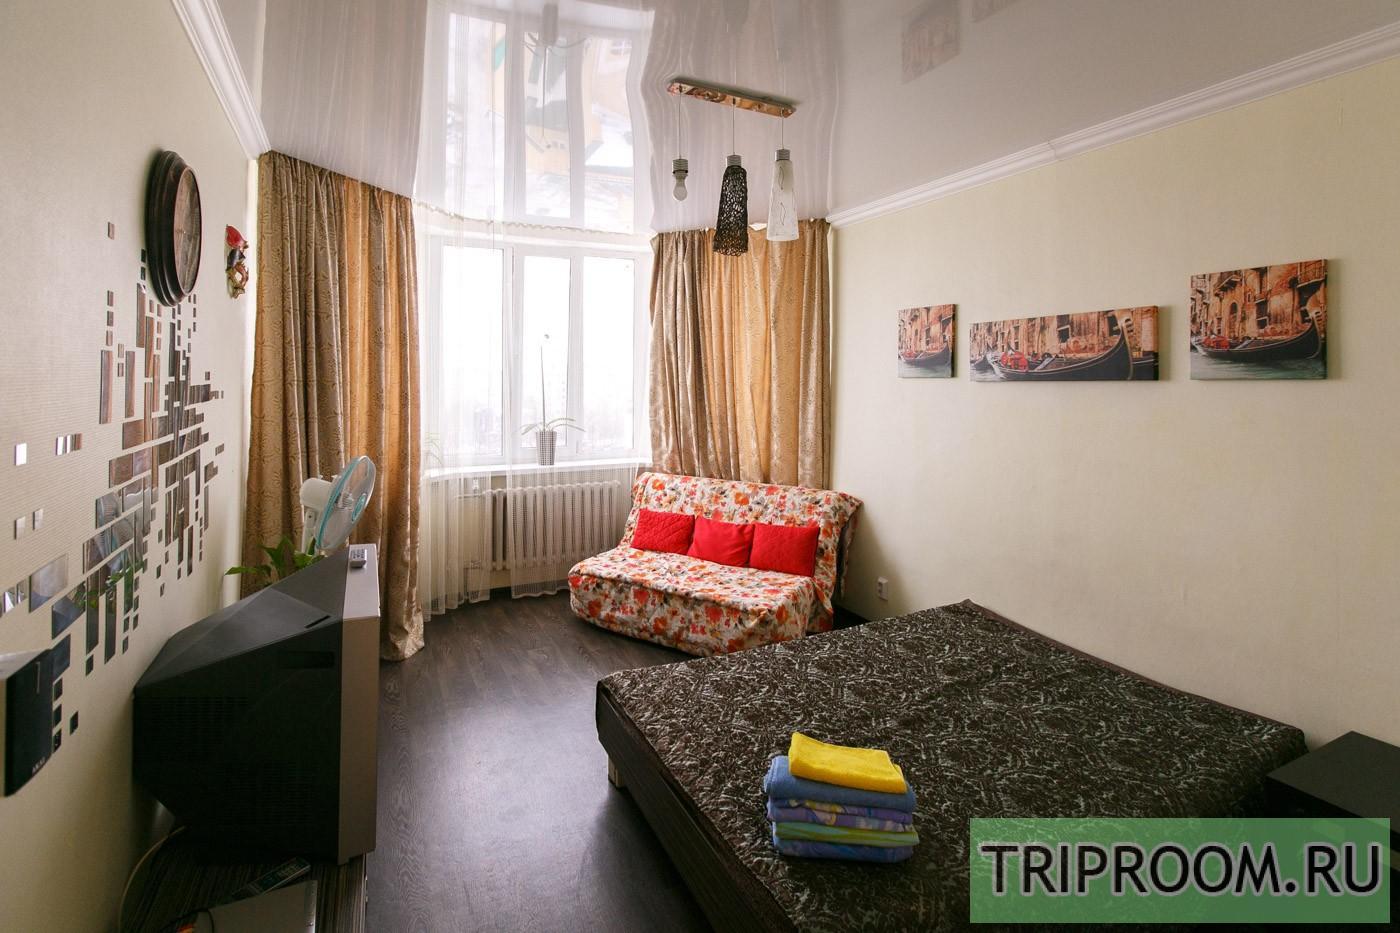 1-комнатная квартира посуточно (вариант № 28539), ул. П.И. Смородина, фото № 1